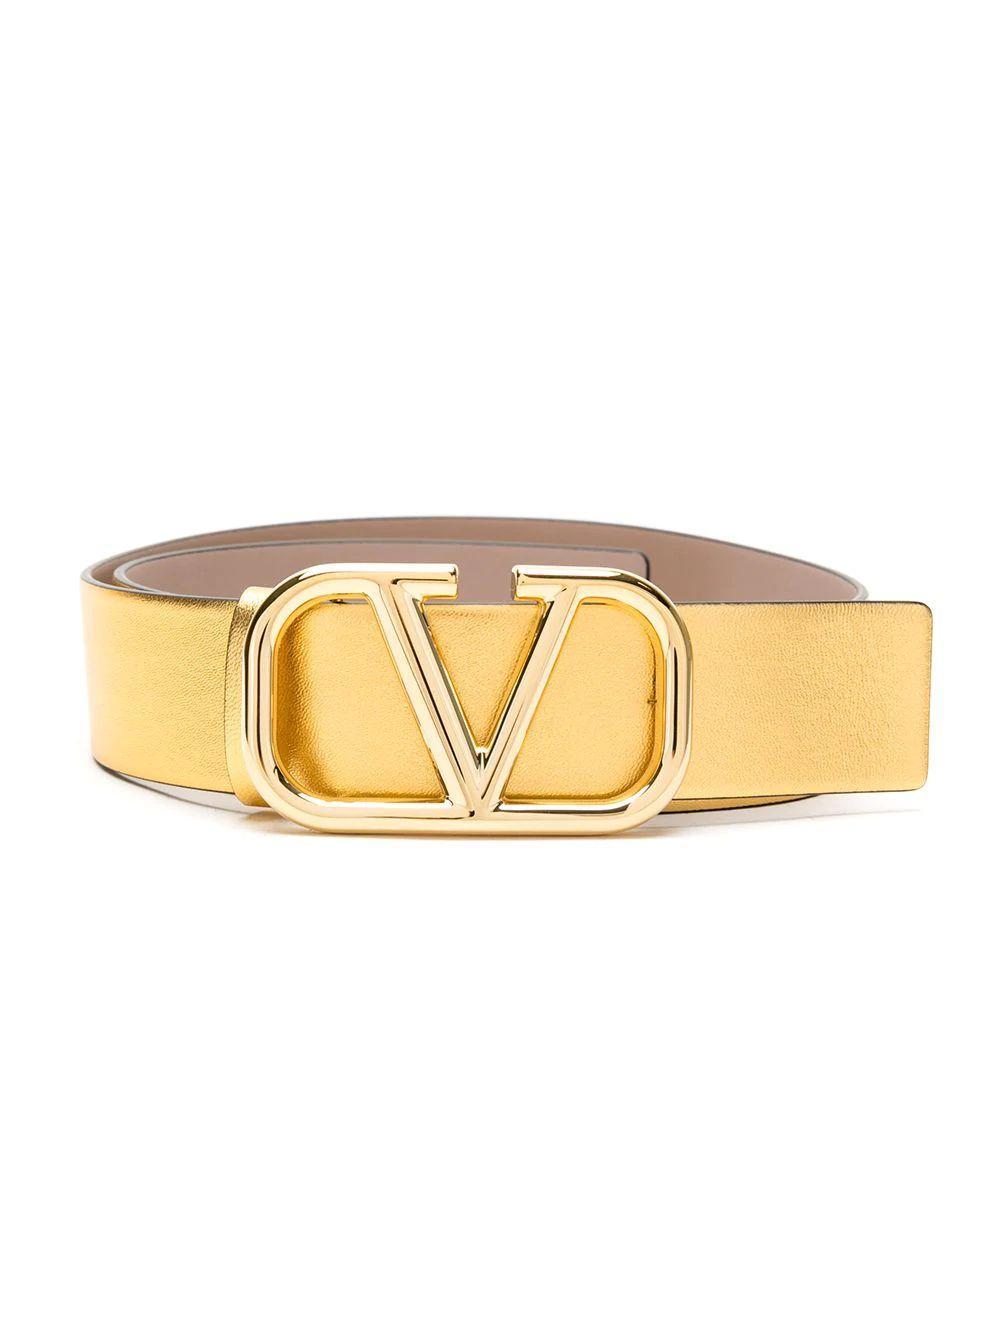 V- Logo 40mm Belt Item # UW2T0S11IVR